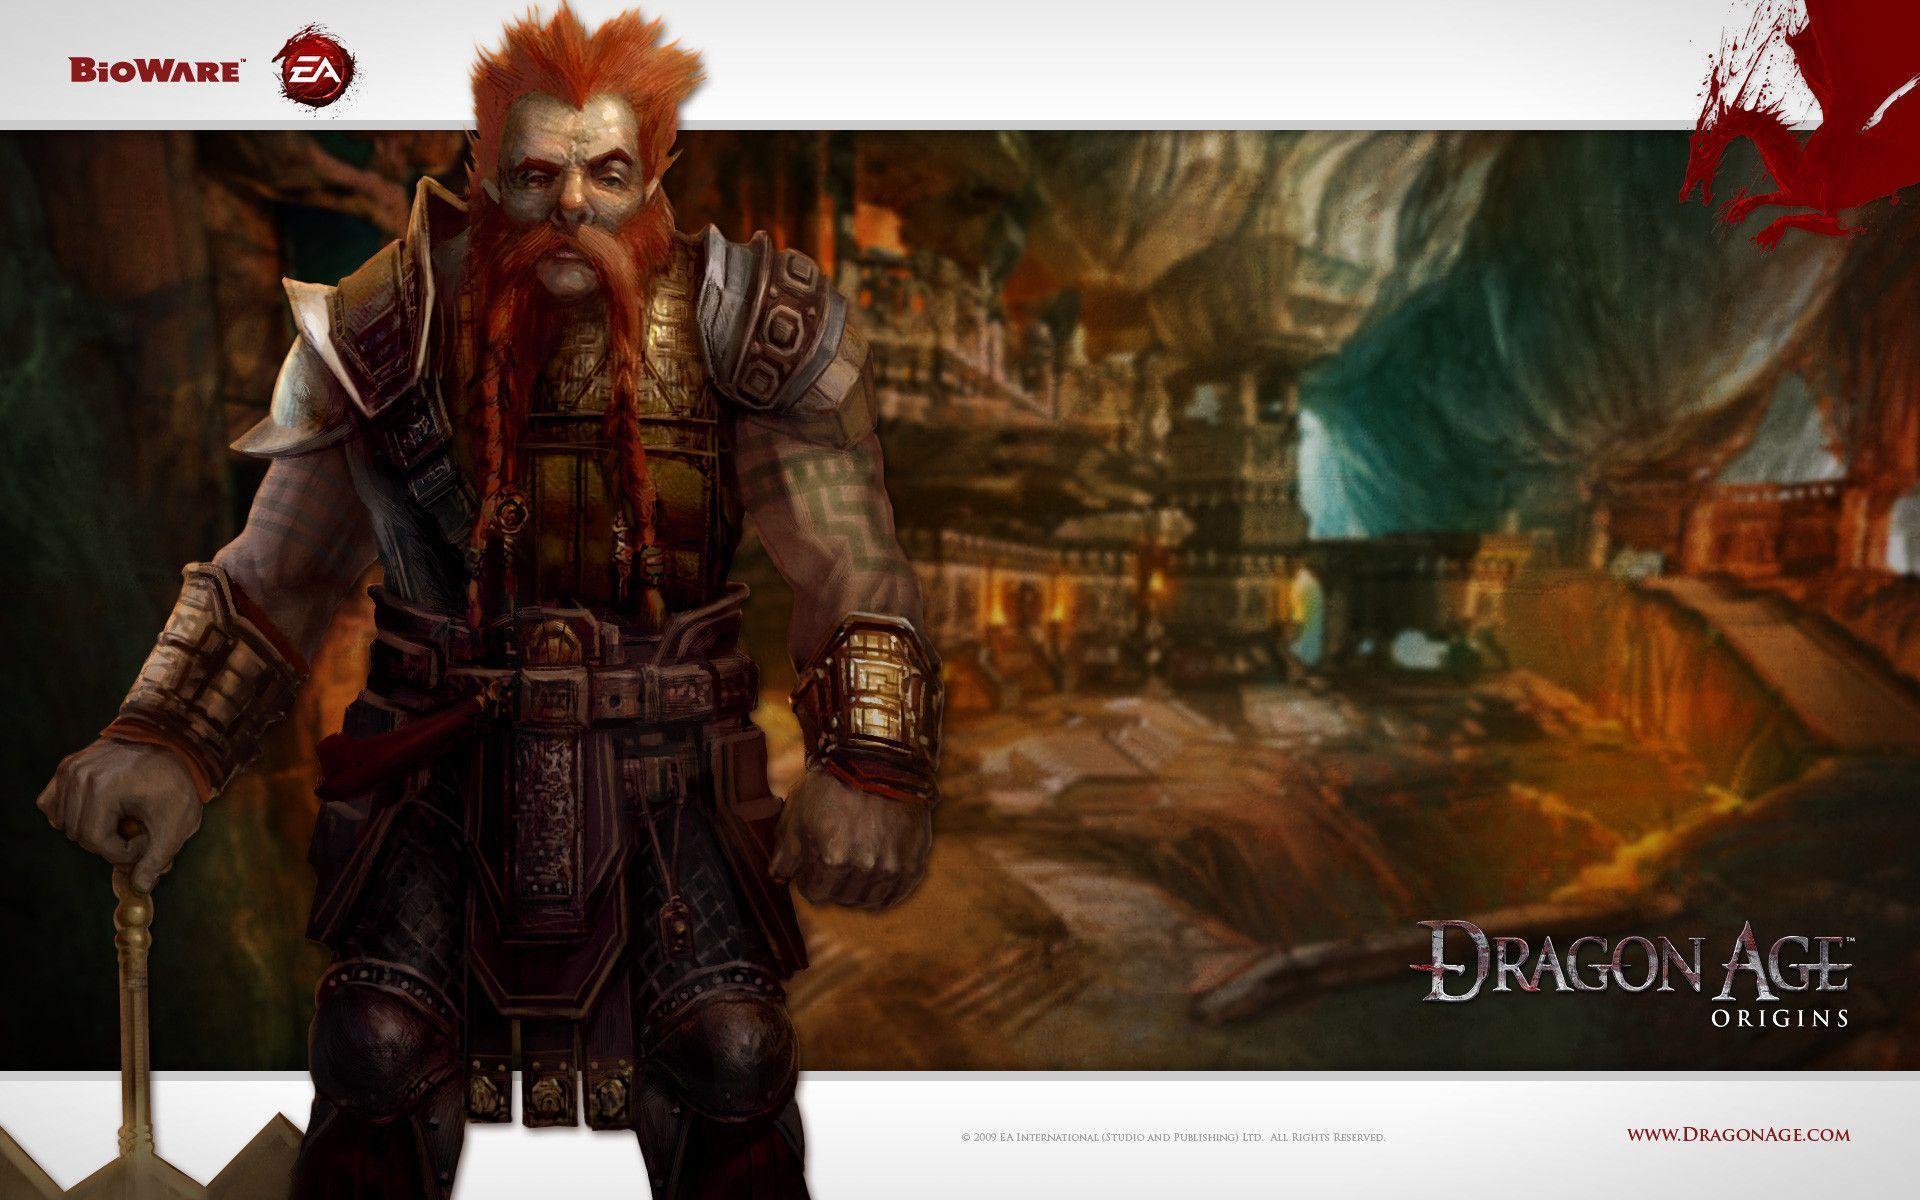 Dragon Age Origins Wallpapers: Dragon Age Origins Wallpapers HD